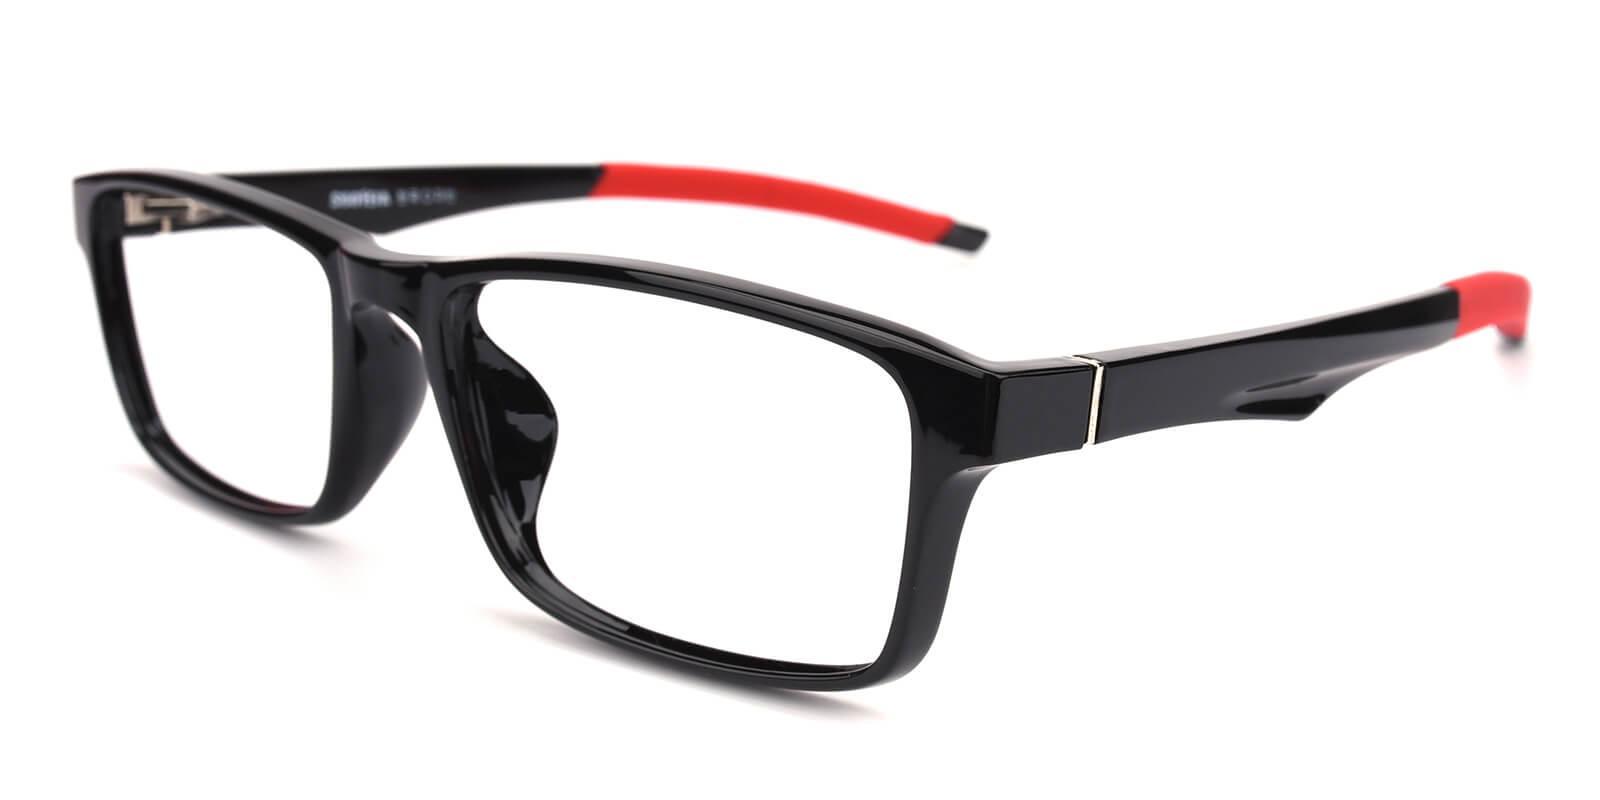 Keionta-Black-Rectangle-TR-SportsGlasses-additional1